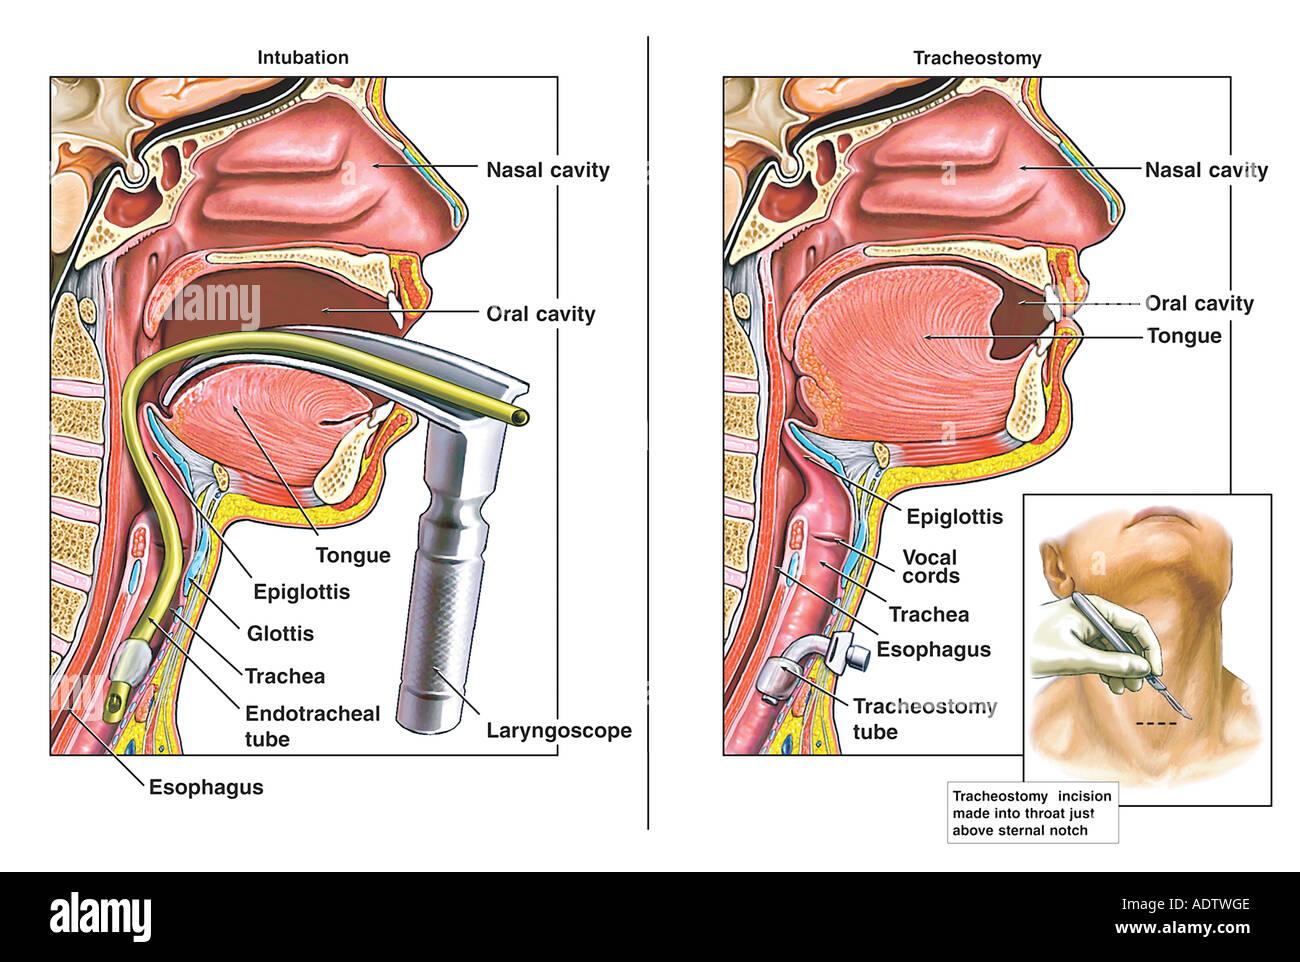 Classic Intubation and Tracheostomy Procedures Stock Photo: 7710413 ...